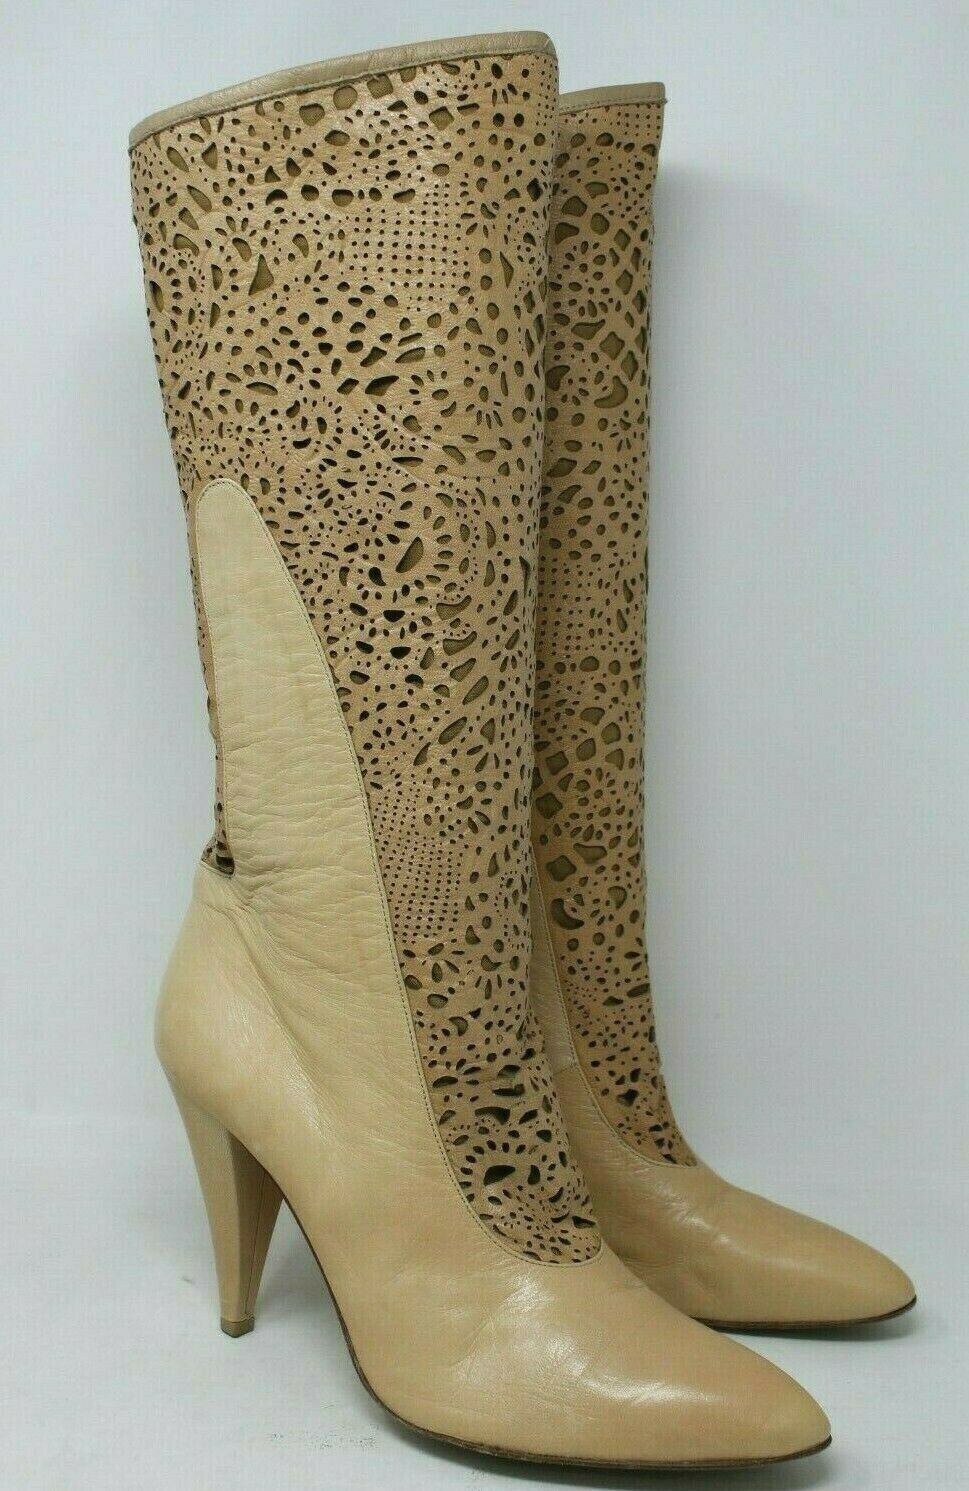 BCBGMAXAZRIA Laser Cut Tall Leather Stiefel in Tan Größe  38.5 EUR, 8 US   2